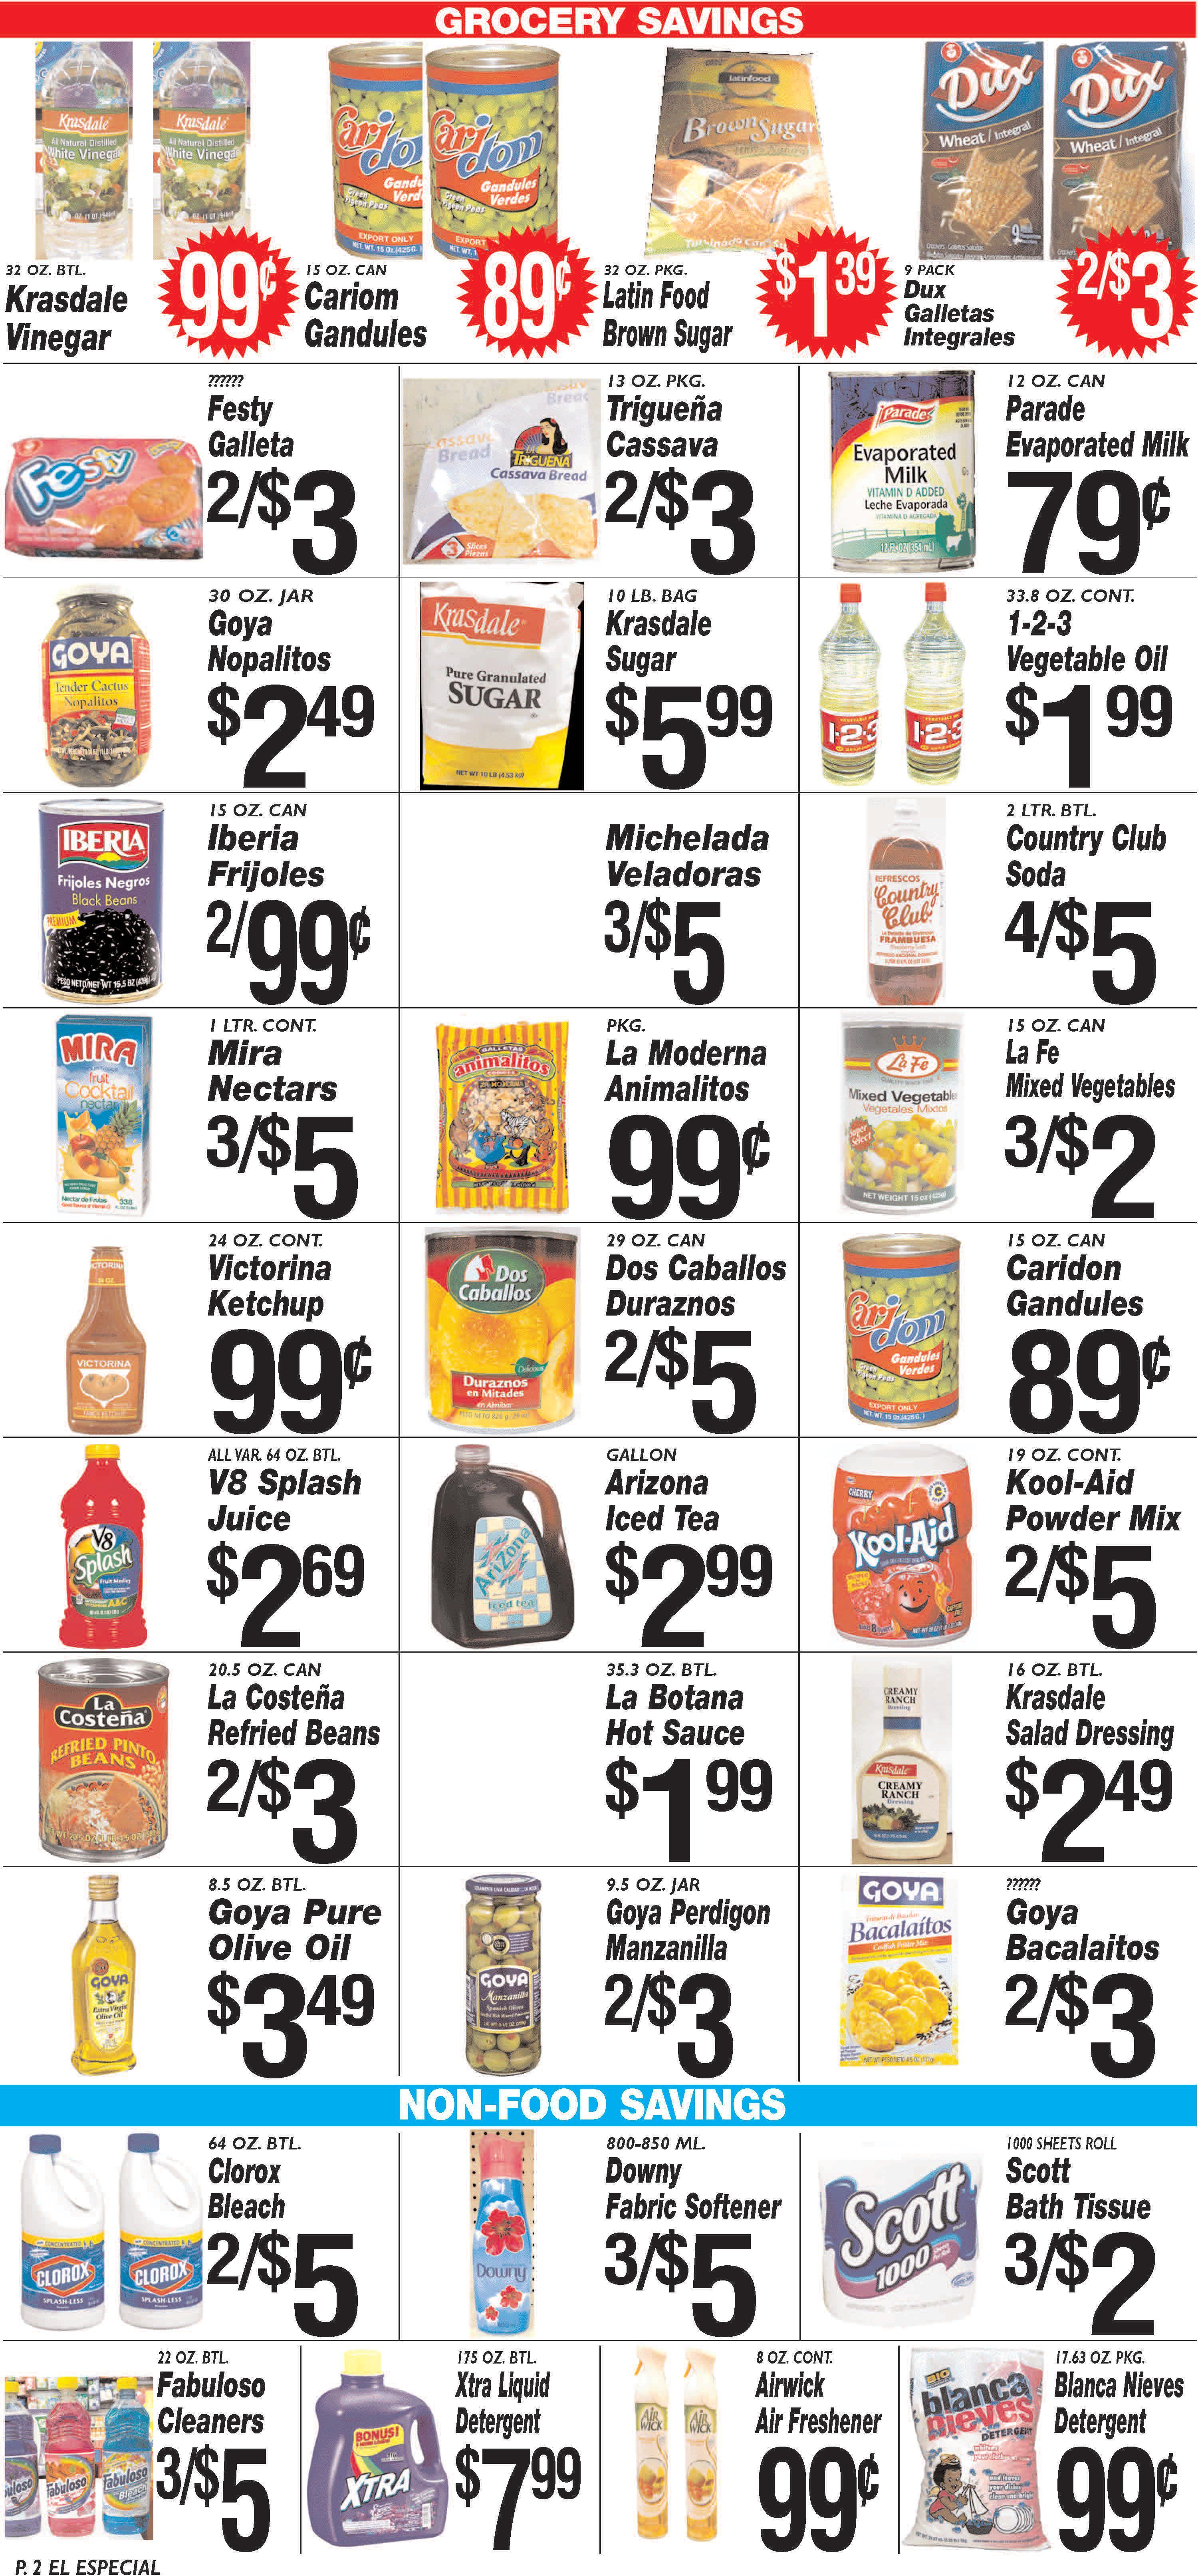 Compare Food Market Passaic Nj